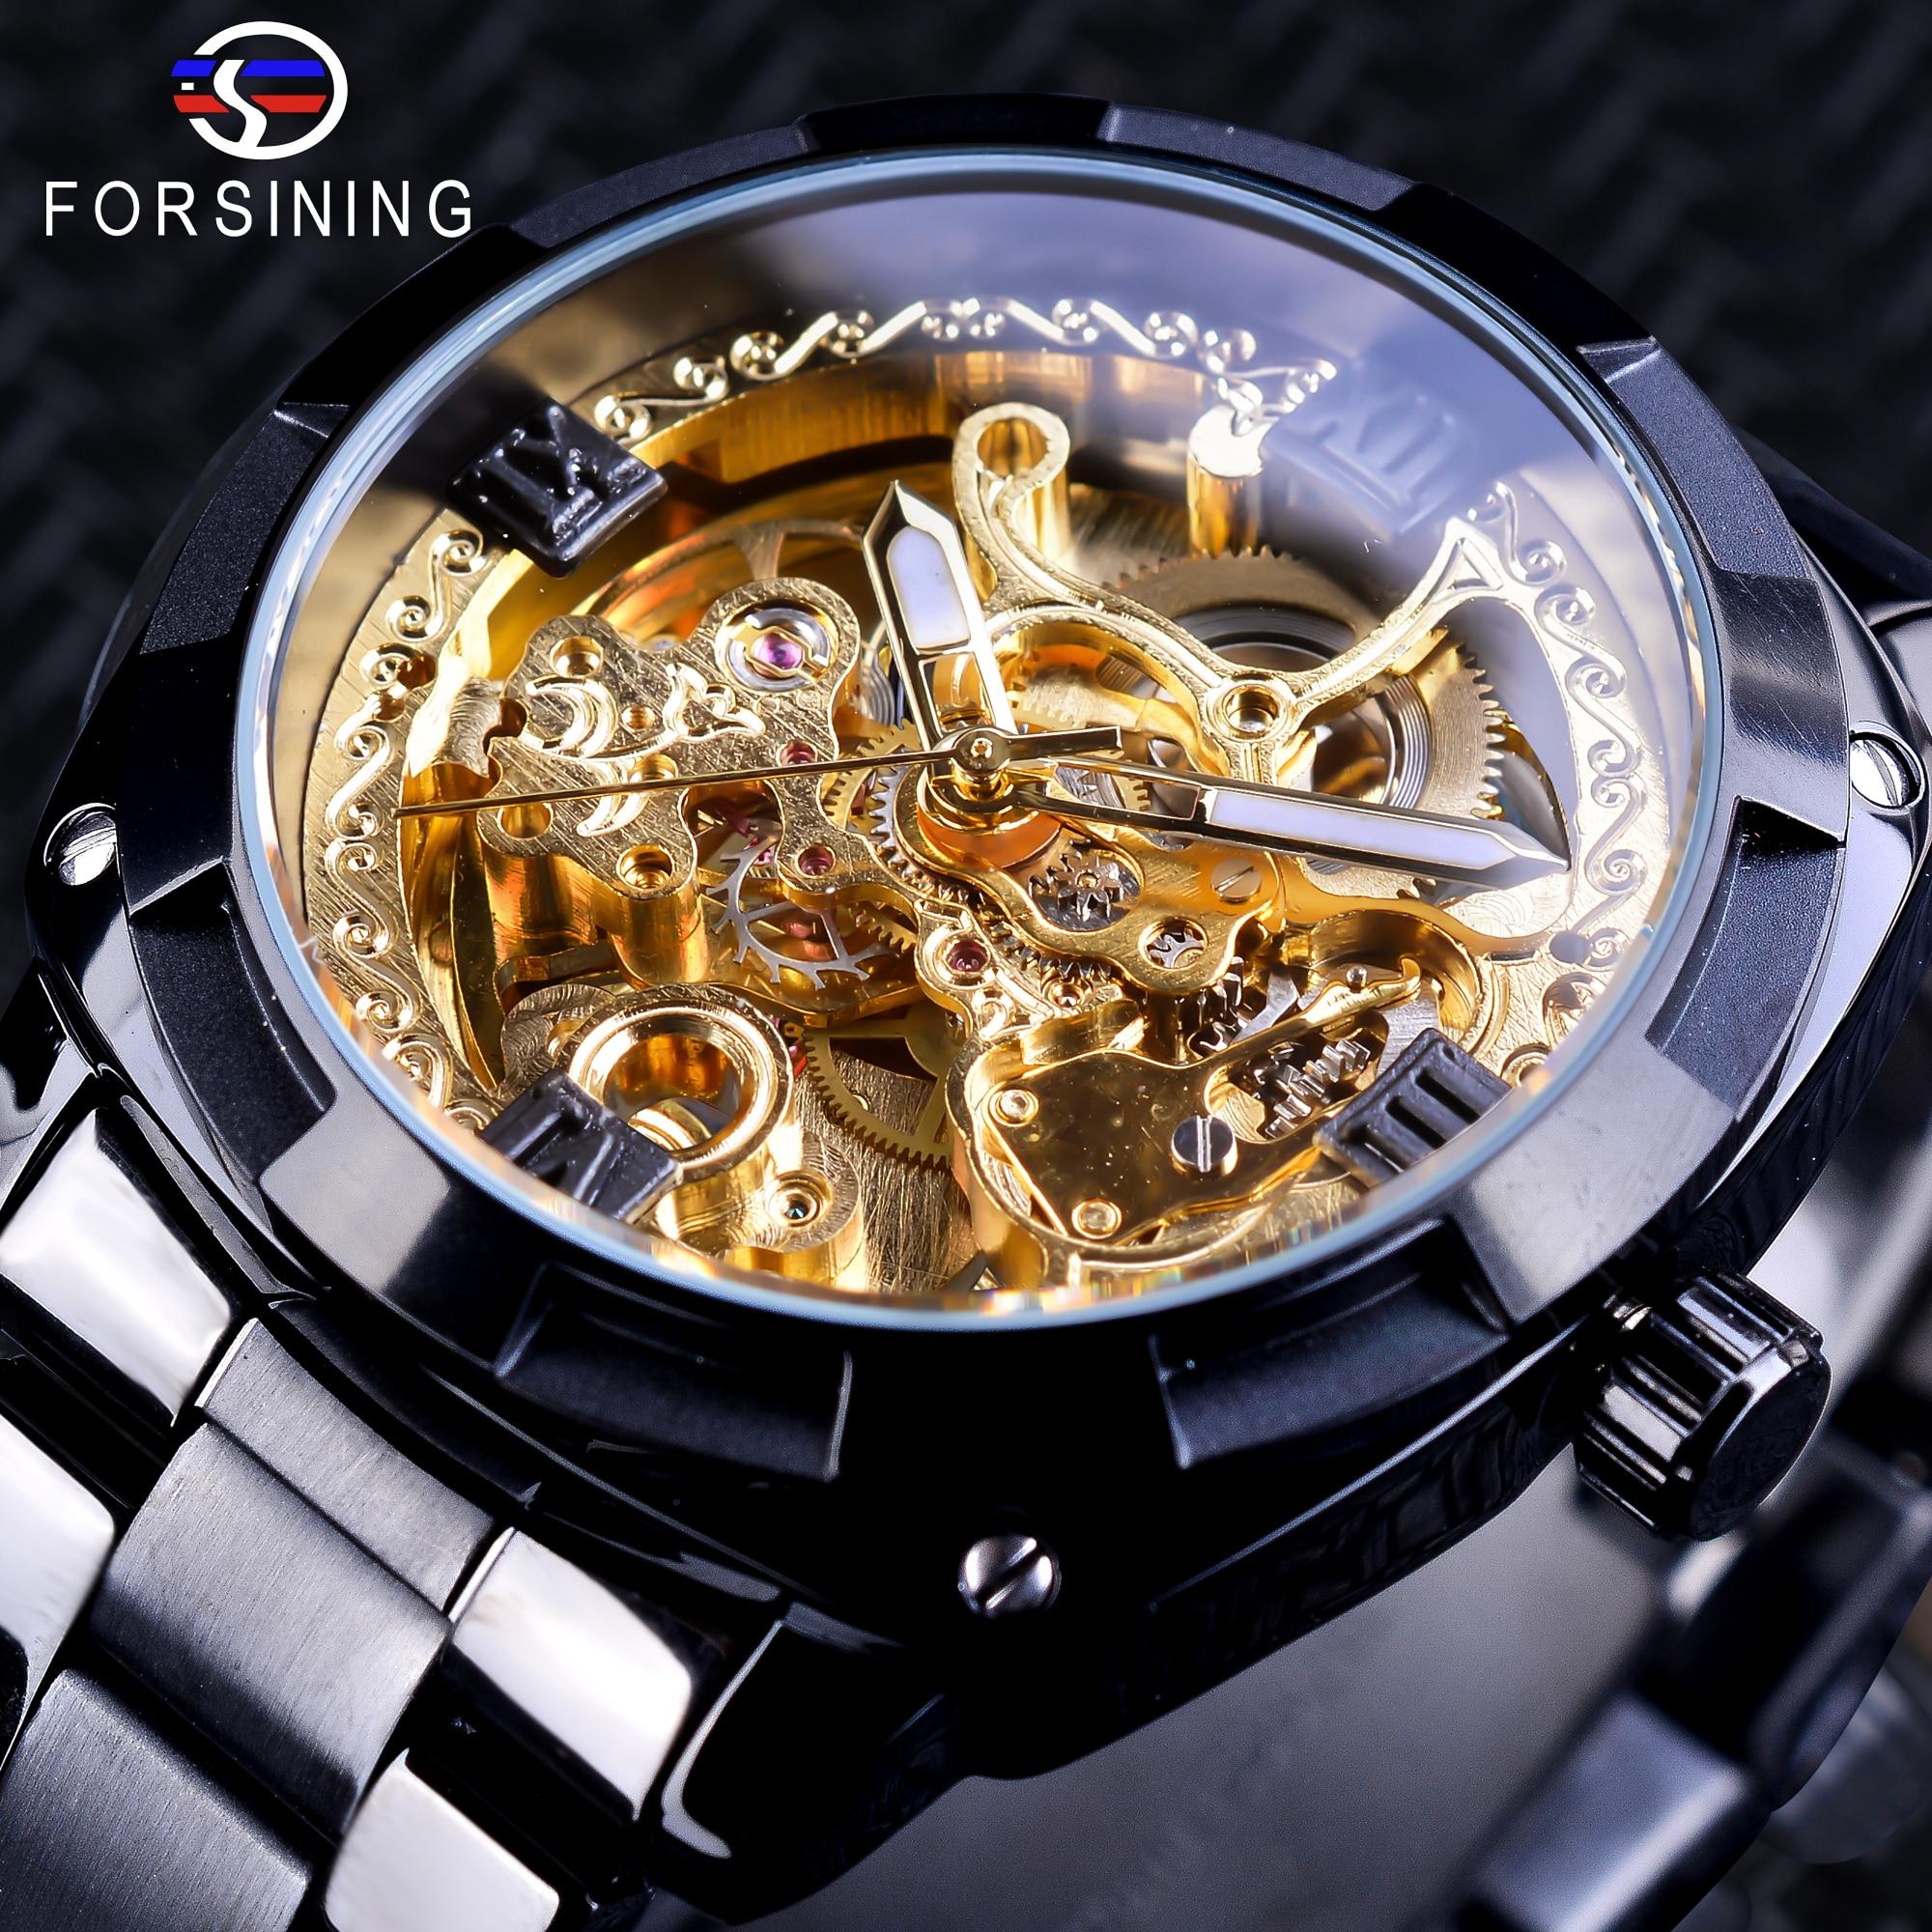 цена Forsining Retro Design Golden Skeleton Black Stainless Steel Transparent Watch Men Automatic Mechanical Watches Top Brand Luxury онлайн в 2017 году